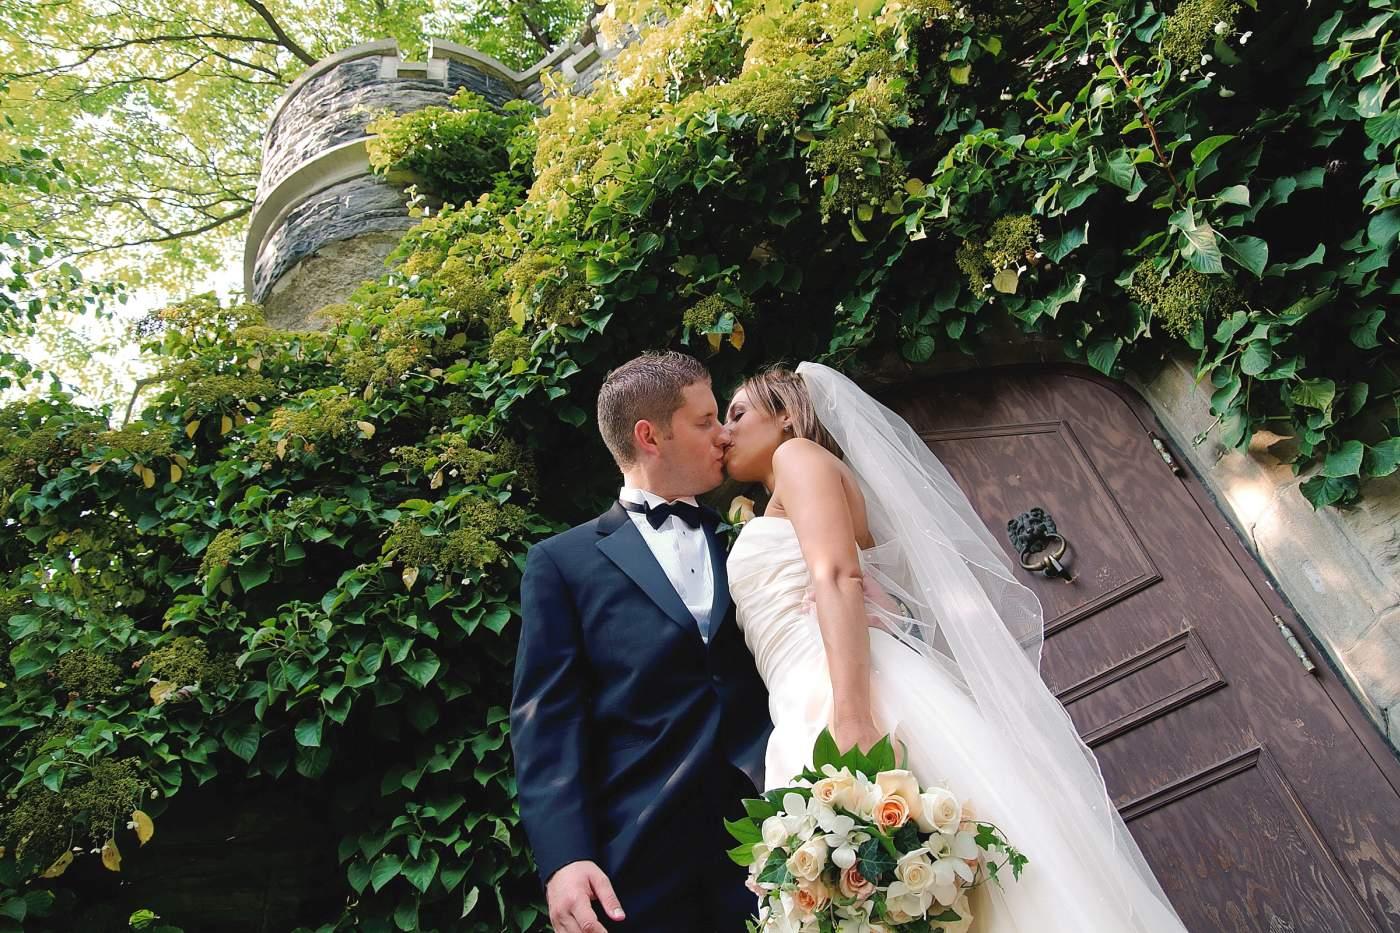 Casa Loma wedding GTA photographer Toronto wedding photographer